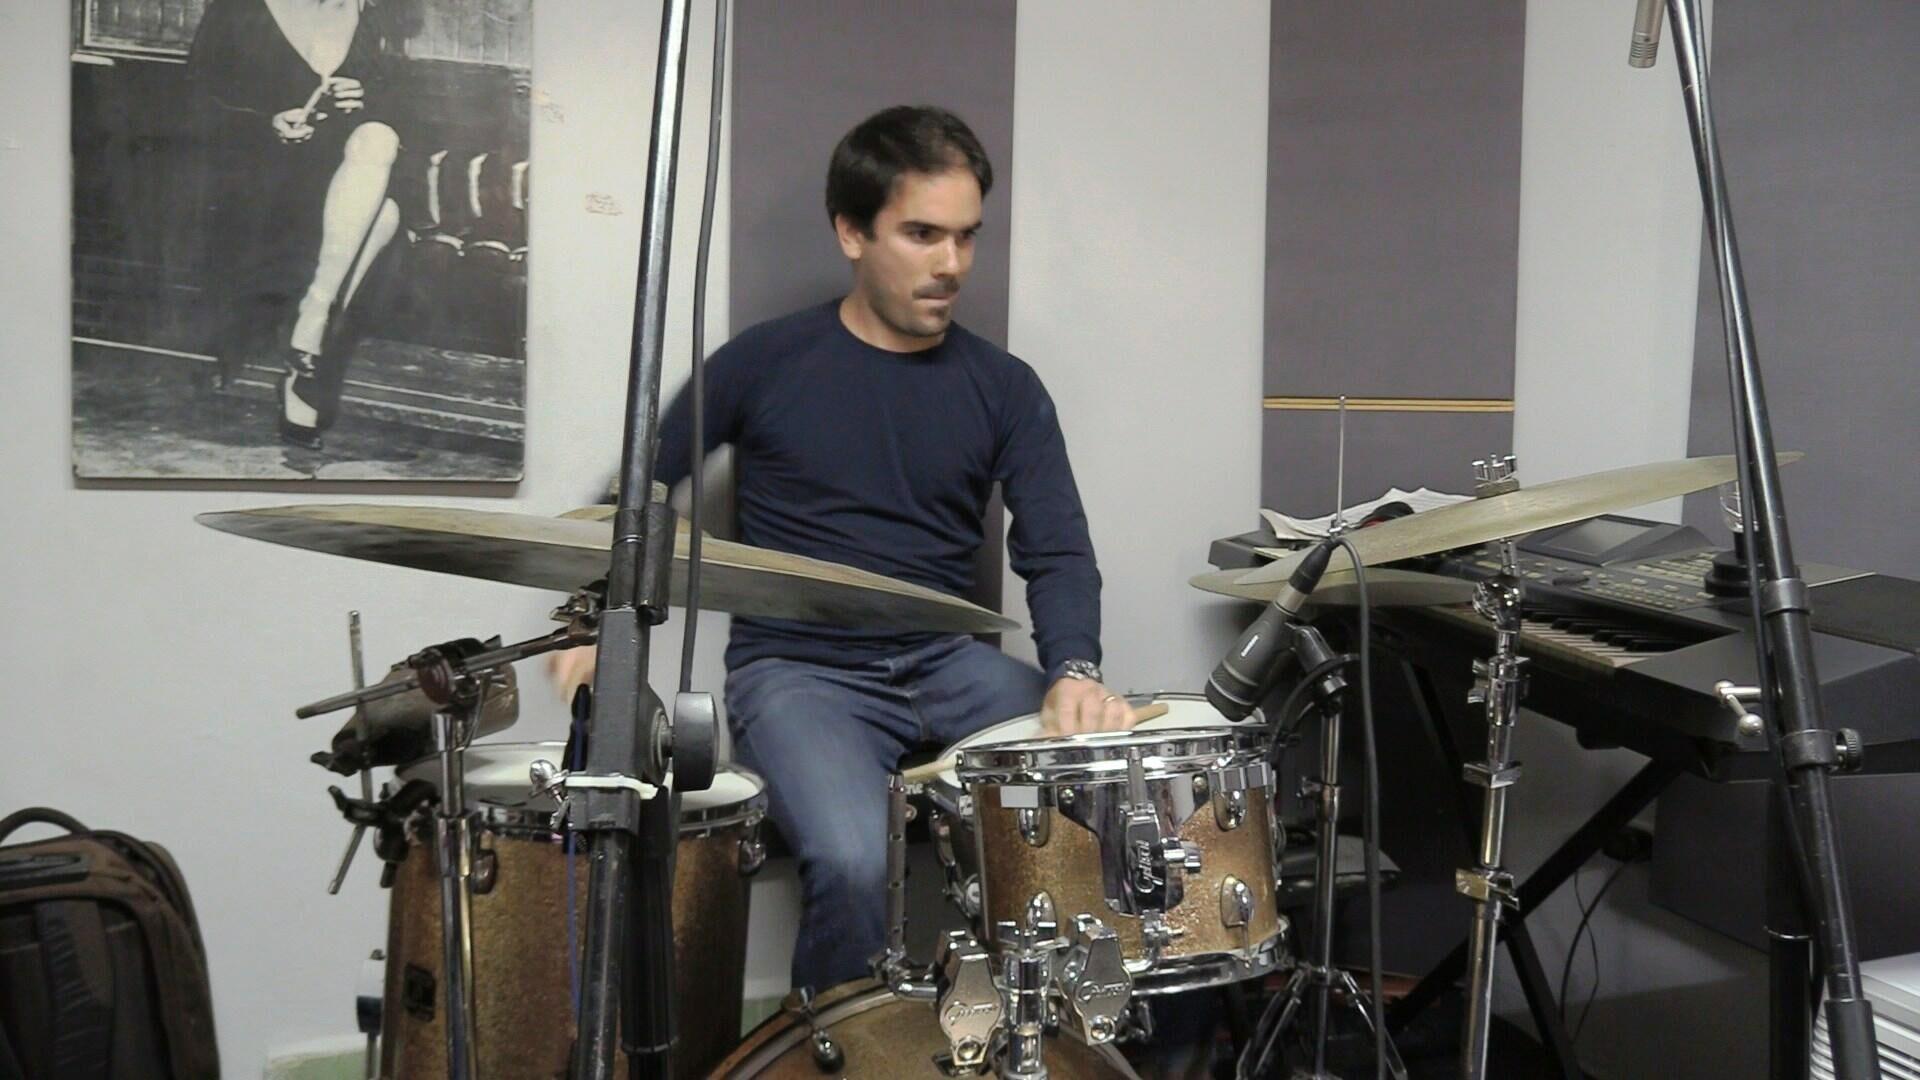 Músico percusionista Ruy López-Nussa - Sputnik Mundo, 1920, 30.04.2021